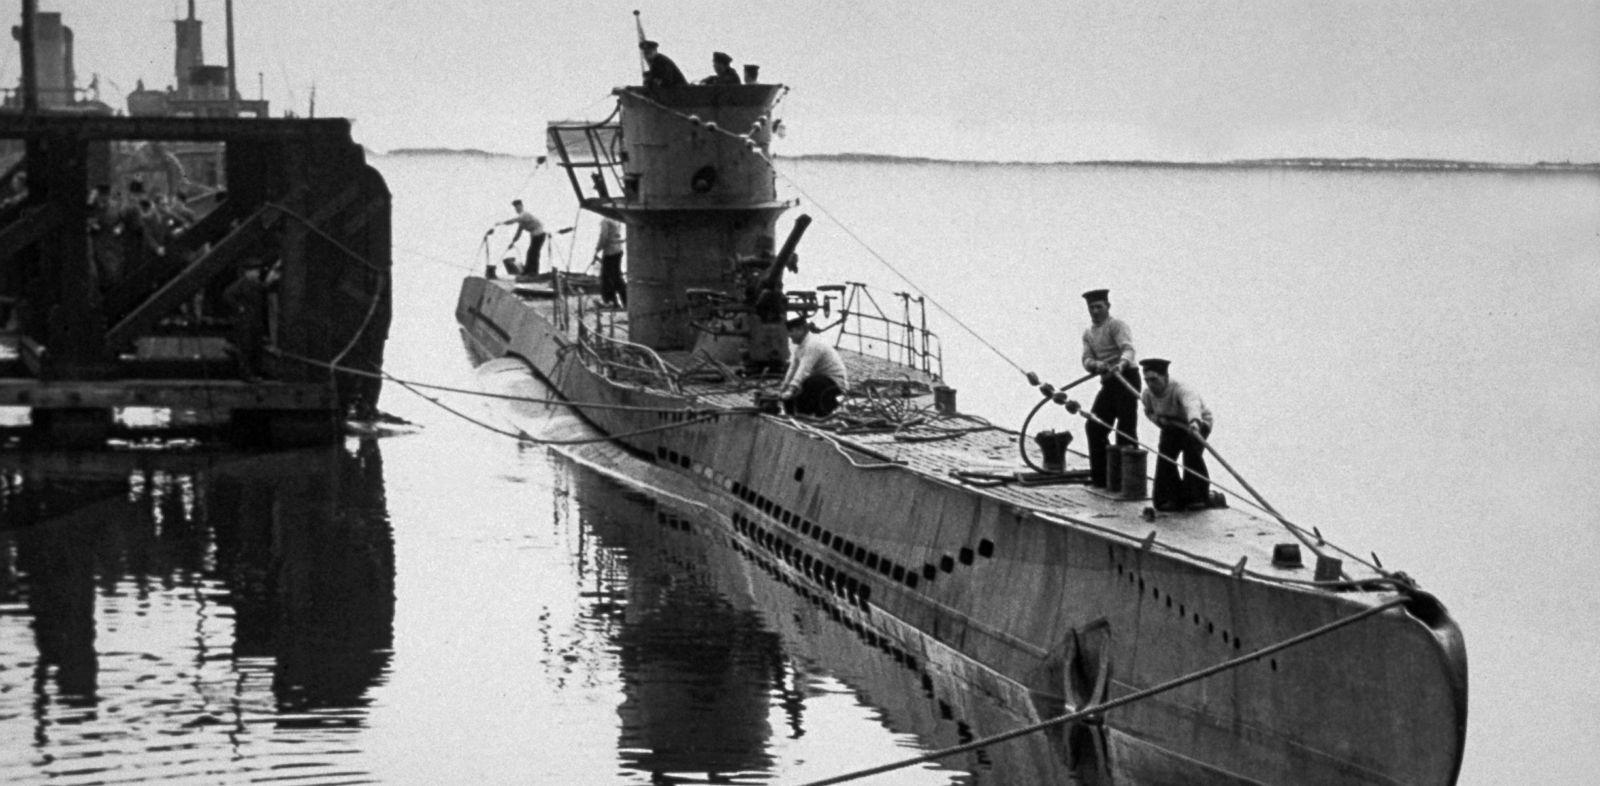 PHOTO: A World War II era German U-Boat is shown in this circa 1941 photo.